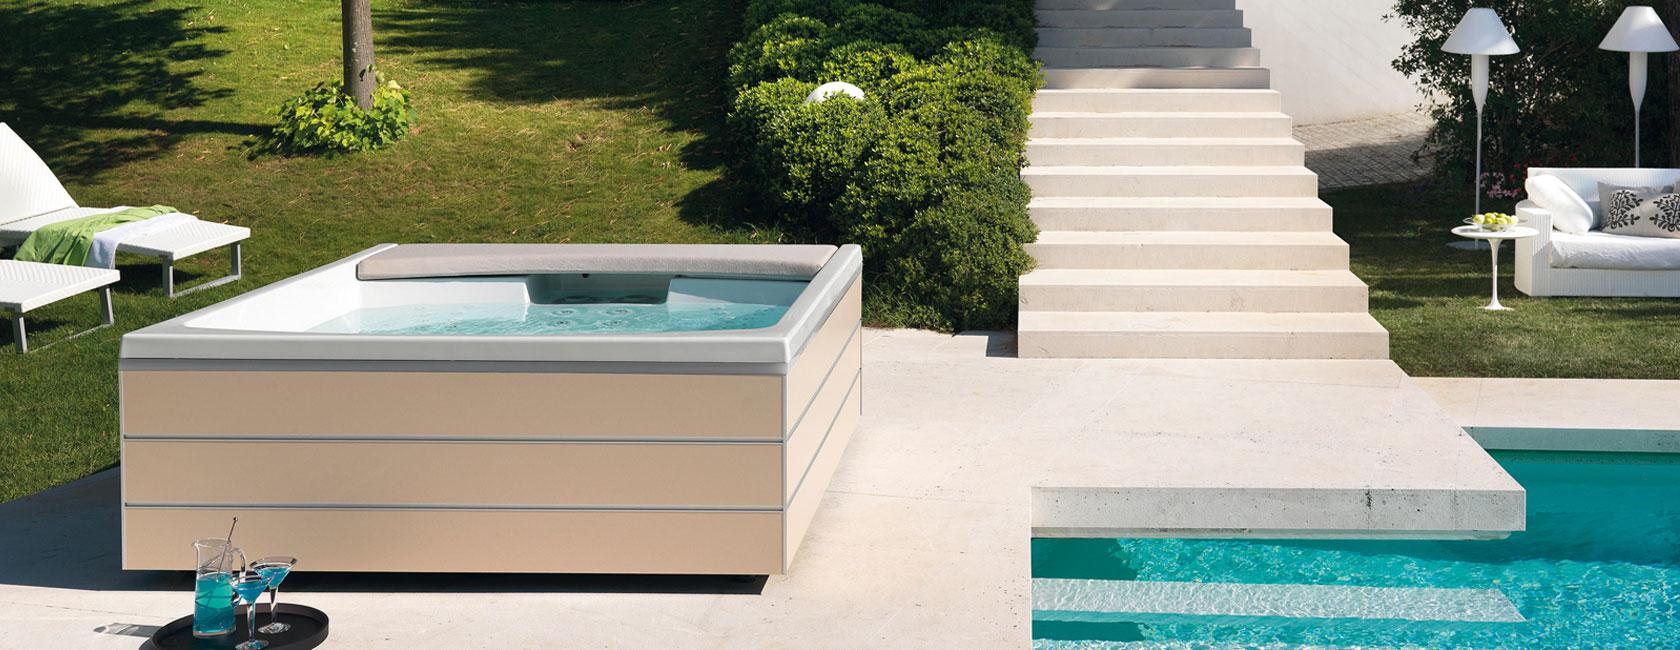 Minipiscine e vasche idromassaggio da esterno tassonedil for Vasca per giardino